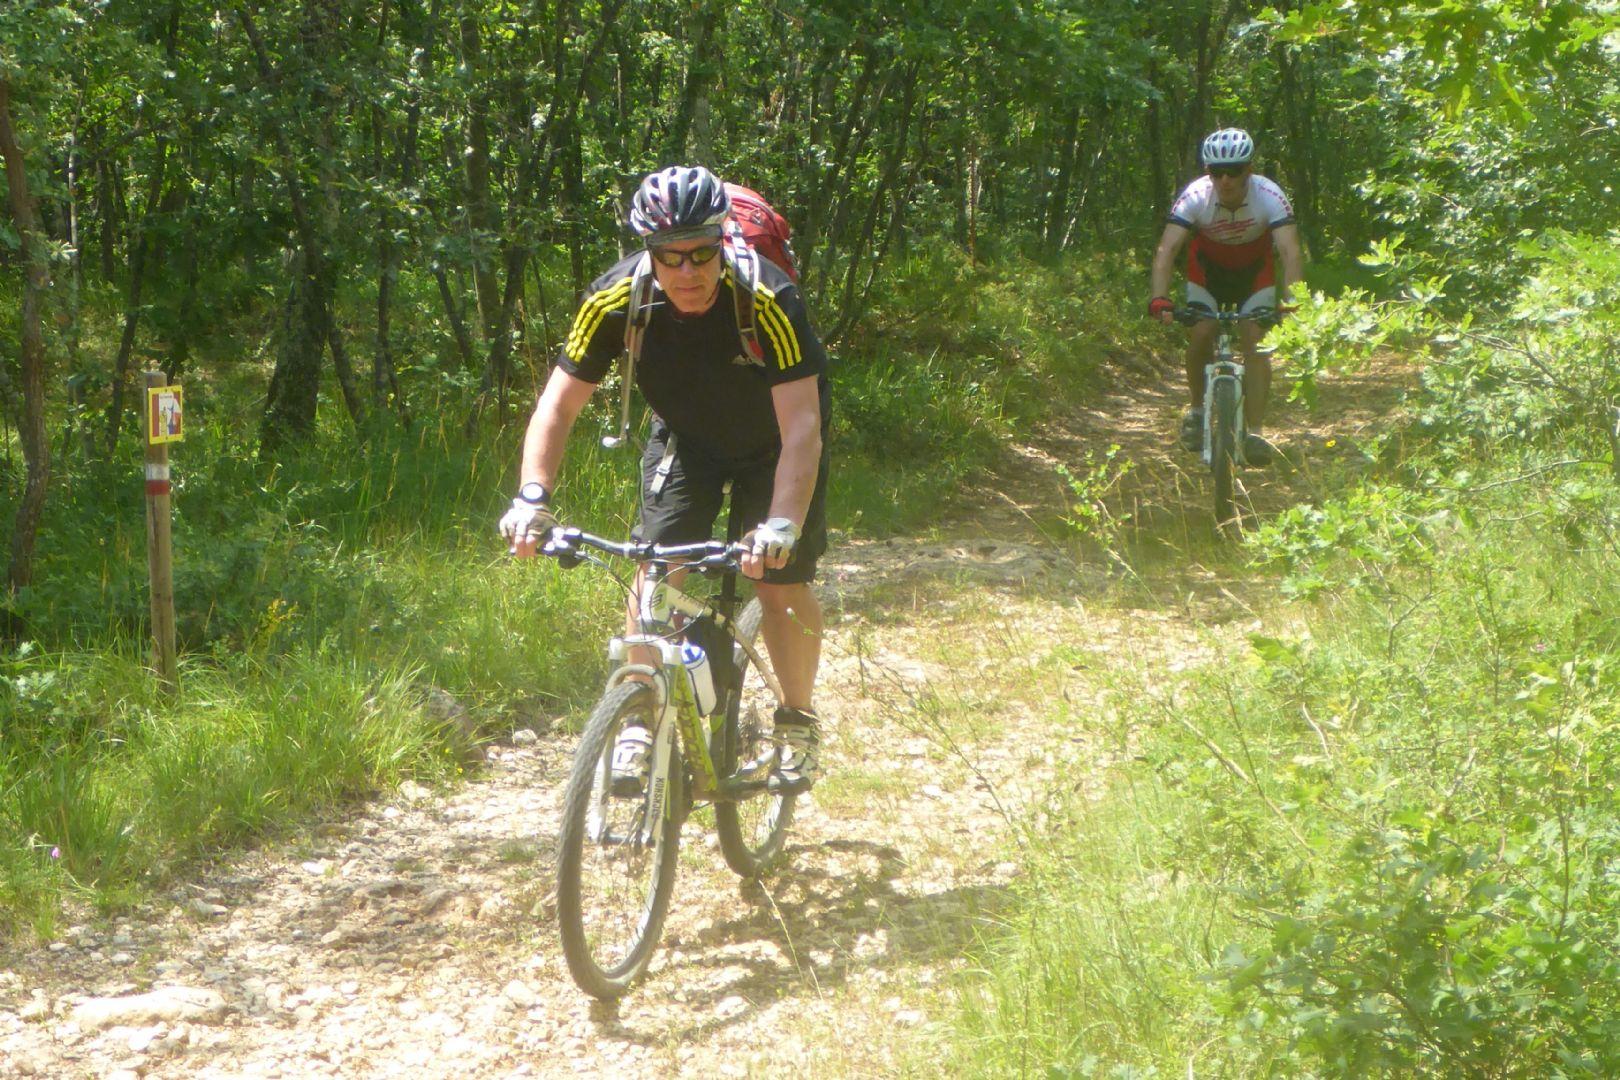 P1010574x.jpg - Italy - Tuscany - Sacred Routes - Guided Mountain Bike Holiday - Mountain Biking